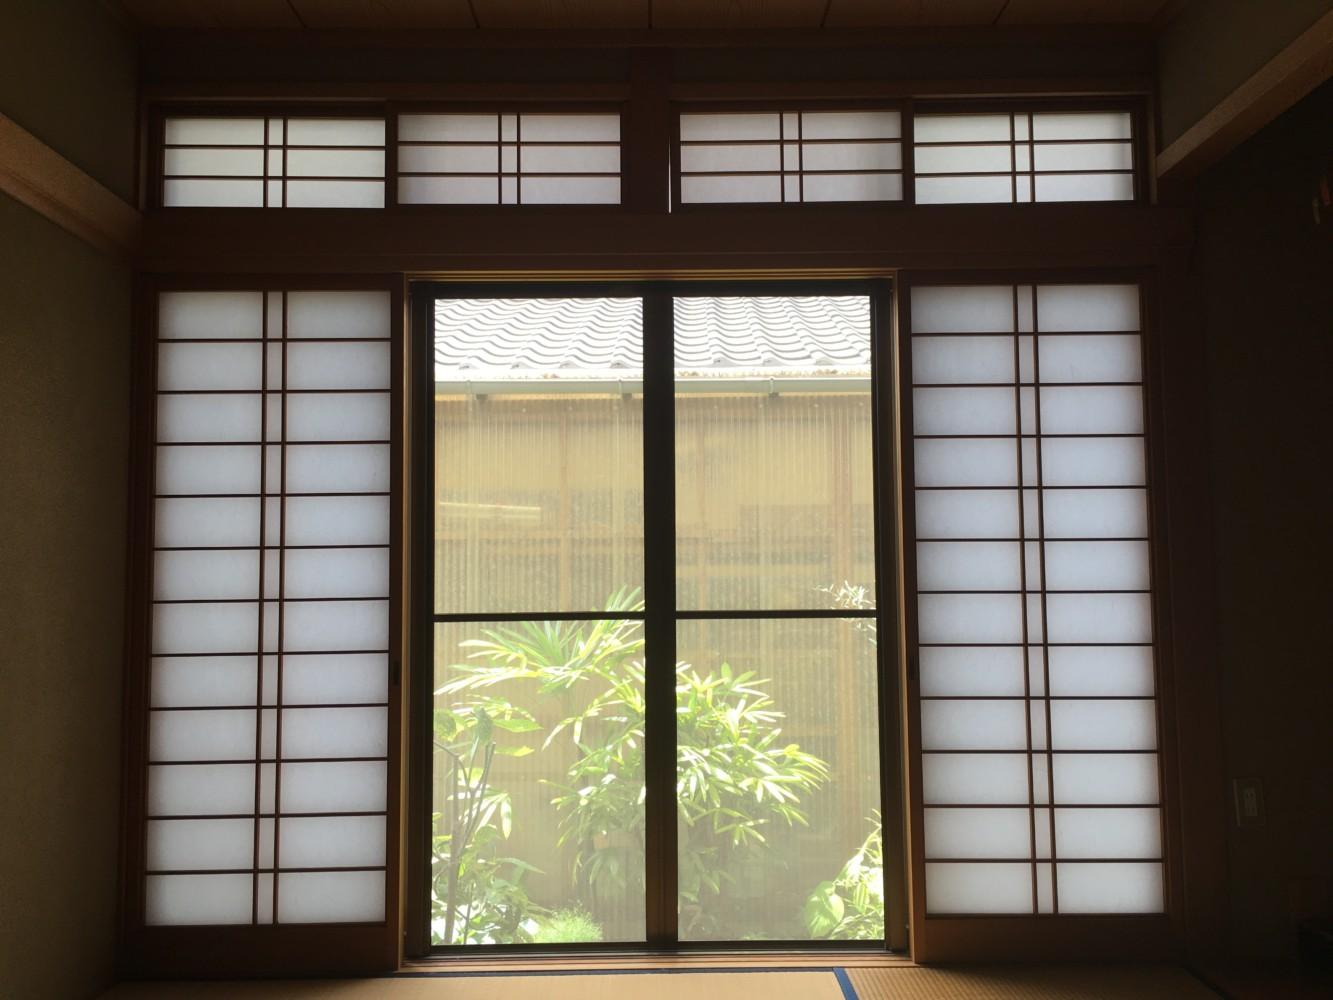 岡山市北区/2階戸襖,1階障子貼り替え